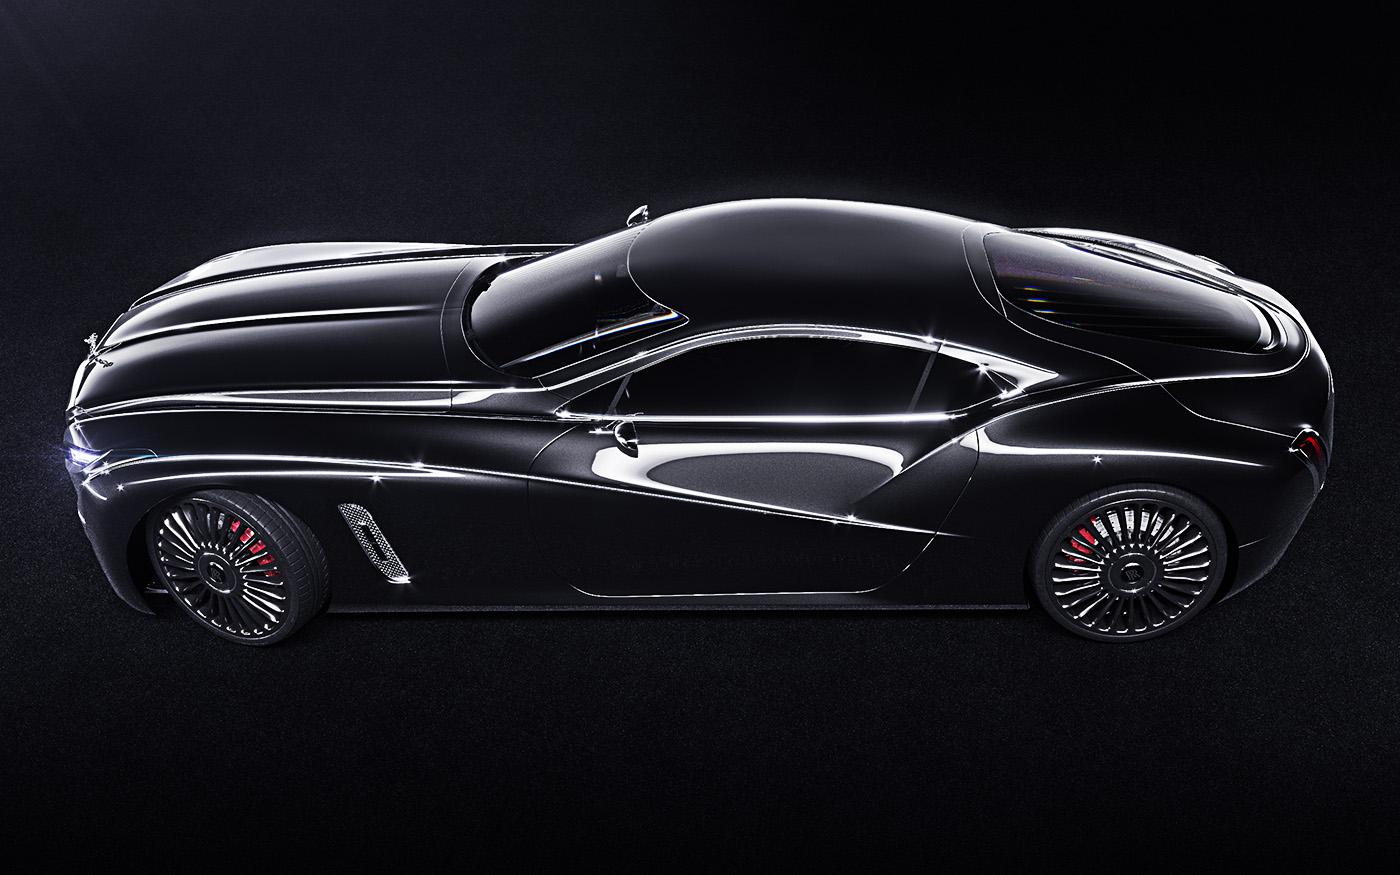 Rolls Royce luxury automotive design 11.jpg